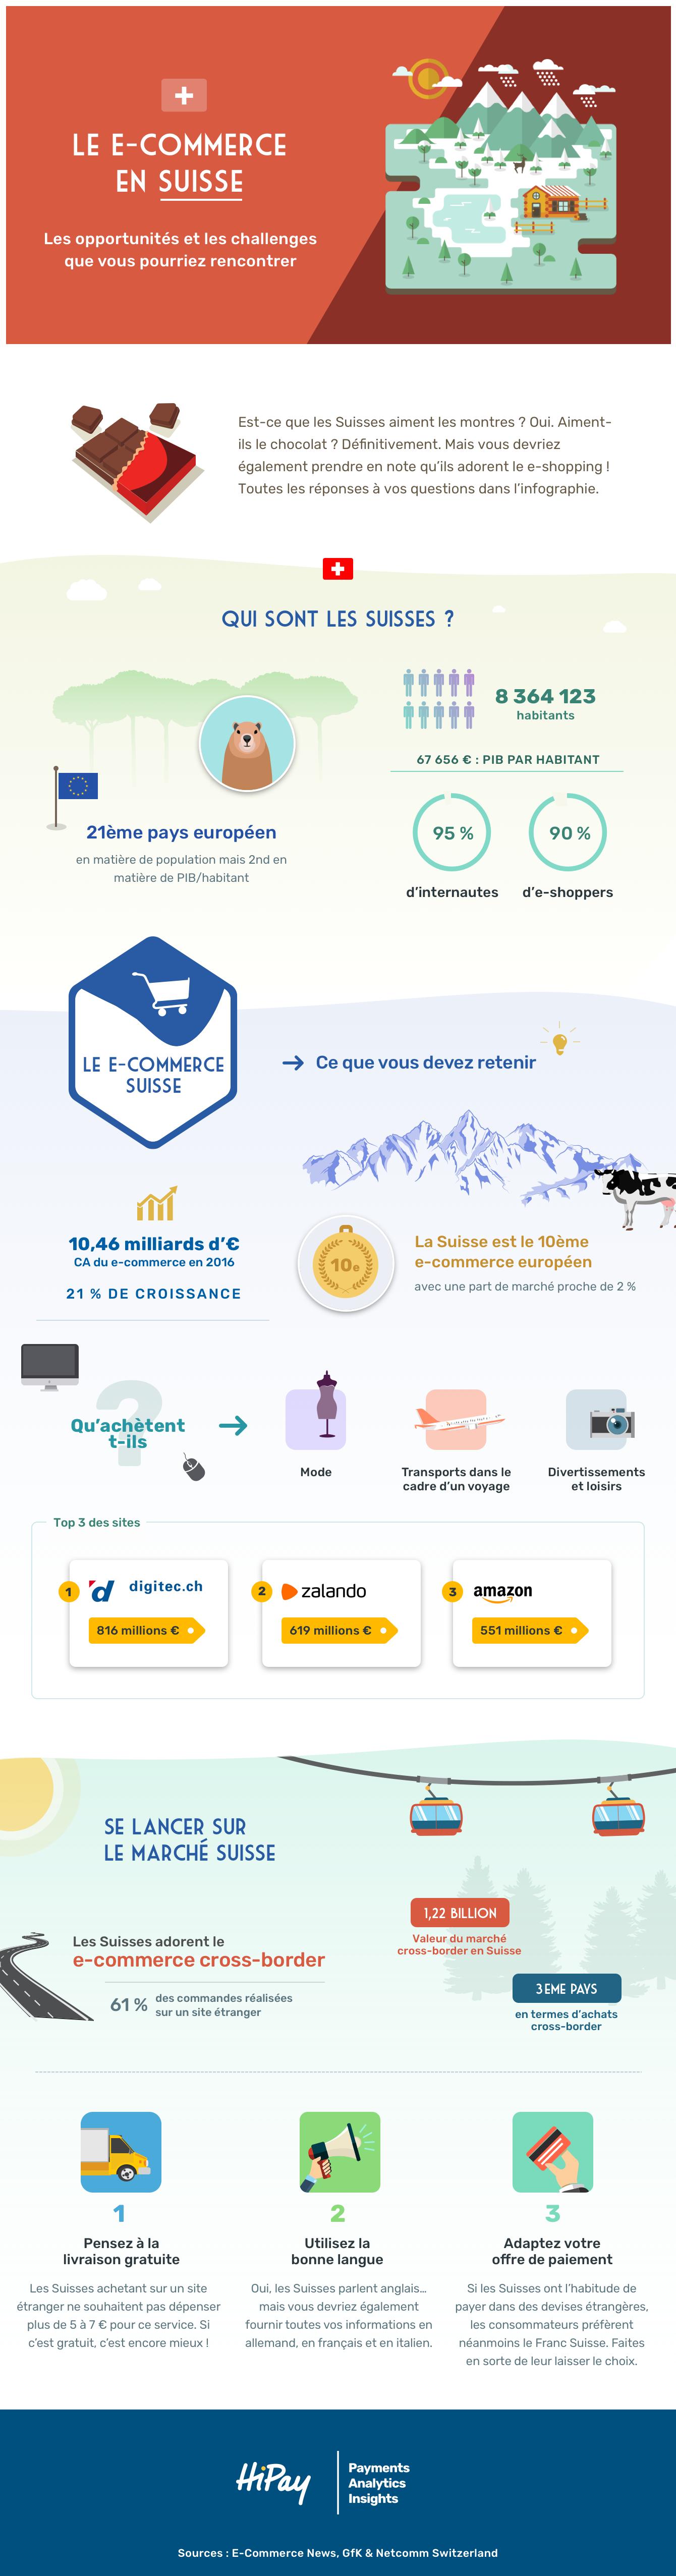 infographie_ecommerce_suisse_fr.png